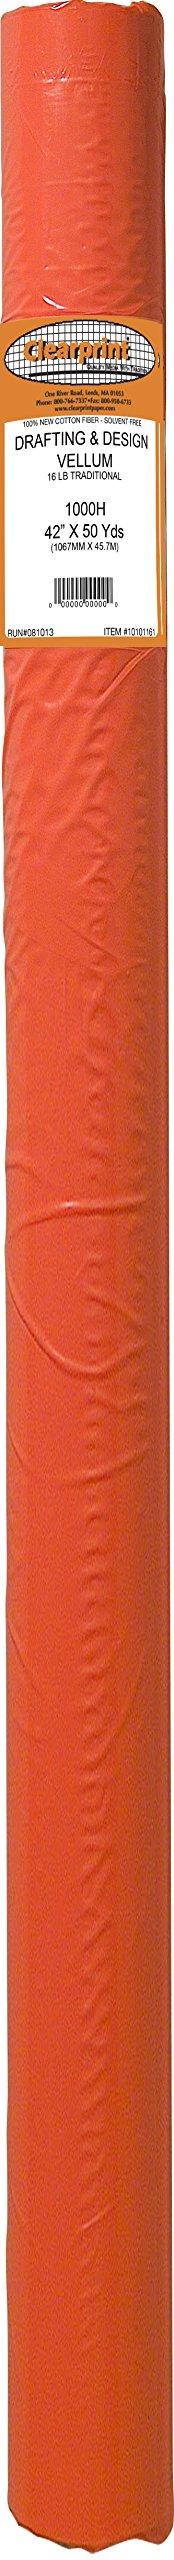 Clearprint 1000H Design Vellum Roll, 16 lb., 100% Cotton, 42 Inches W x 50 Yards Long, 1 Each (10101161)